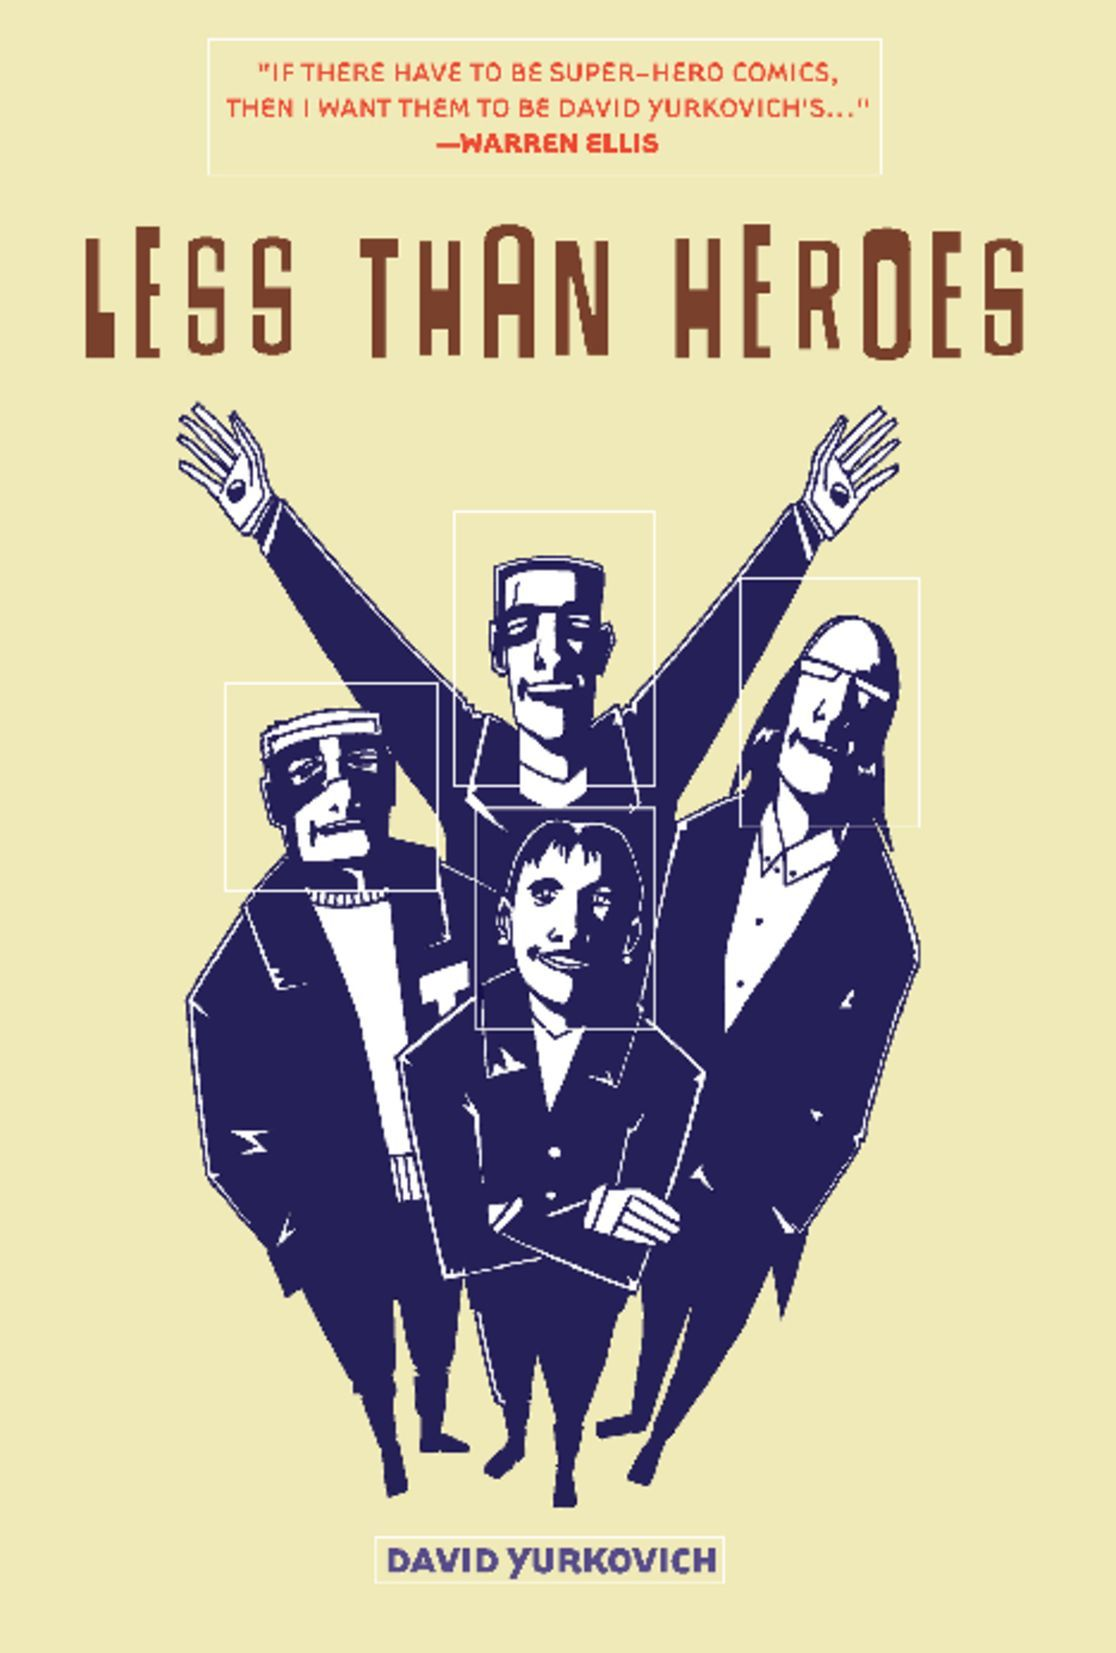 Less Than Heroes Digital